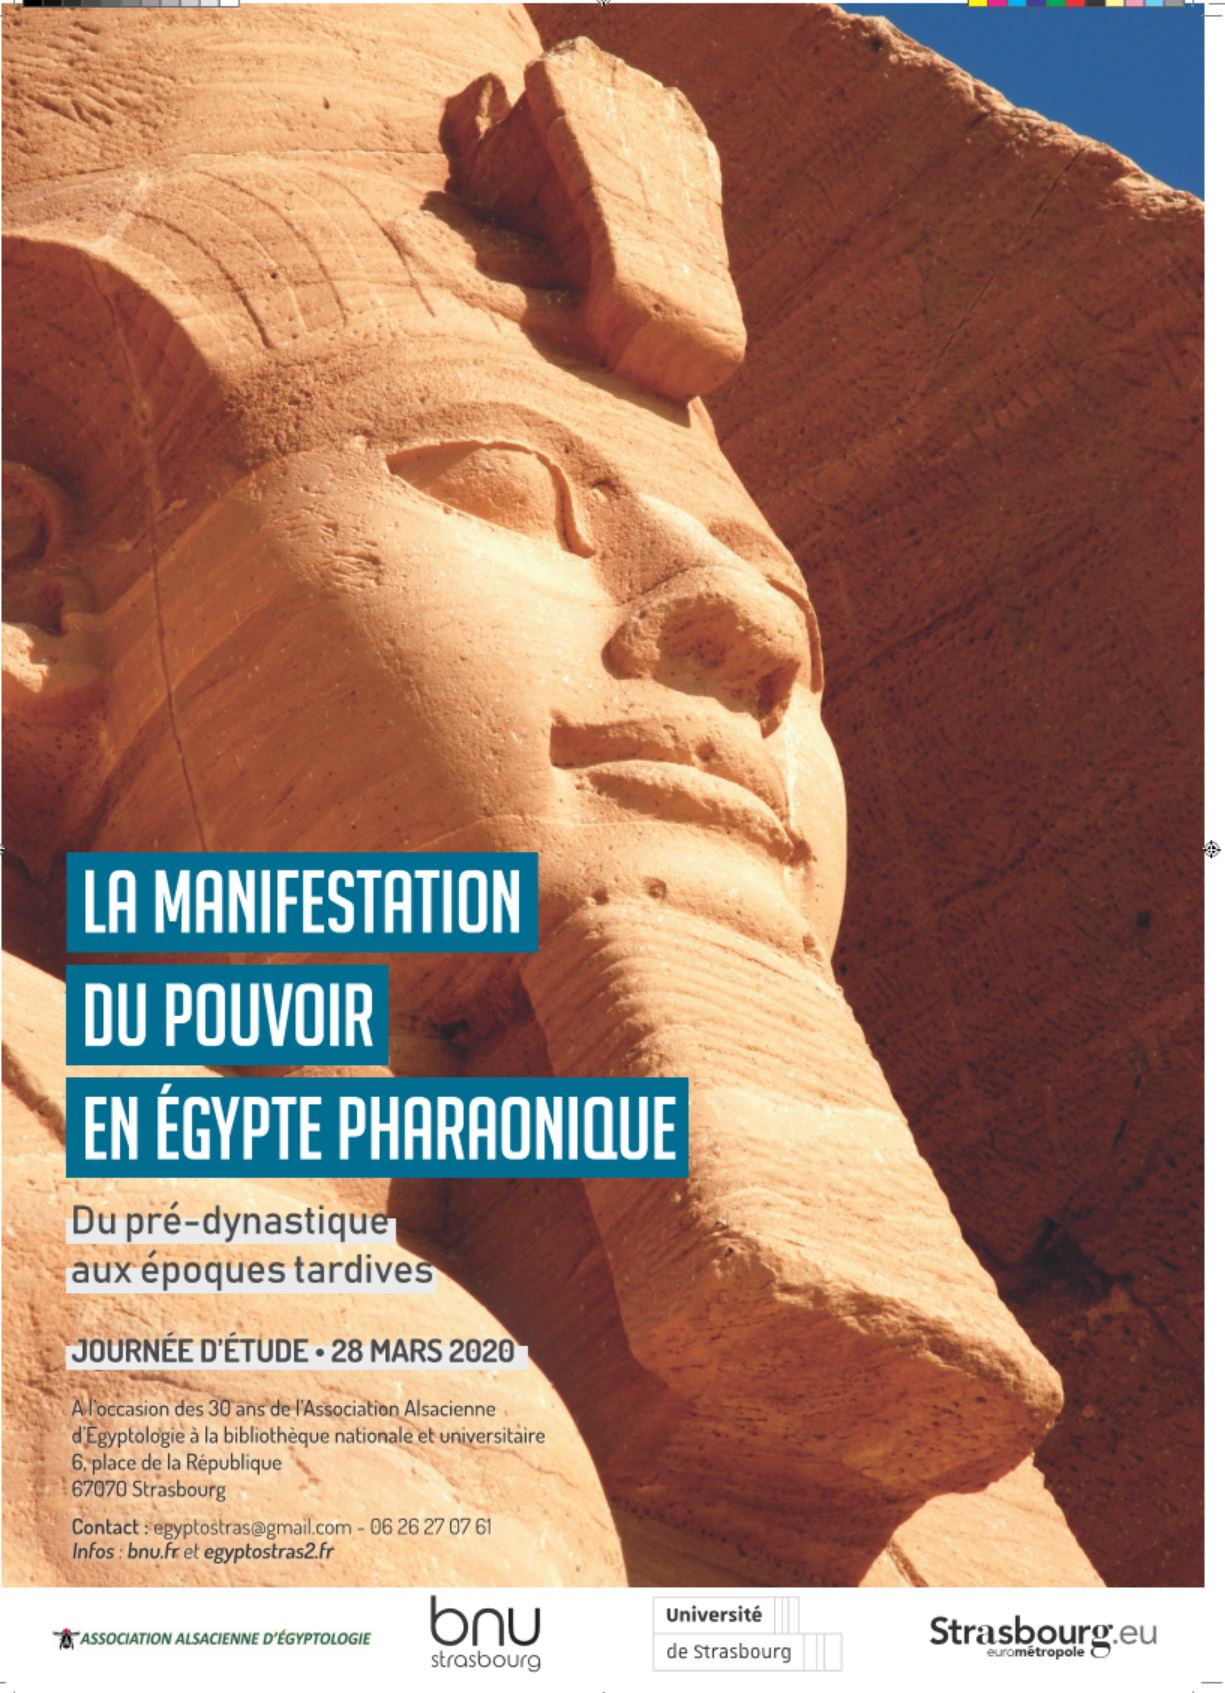 EGYPTONIMES - EGYPTONIMES